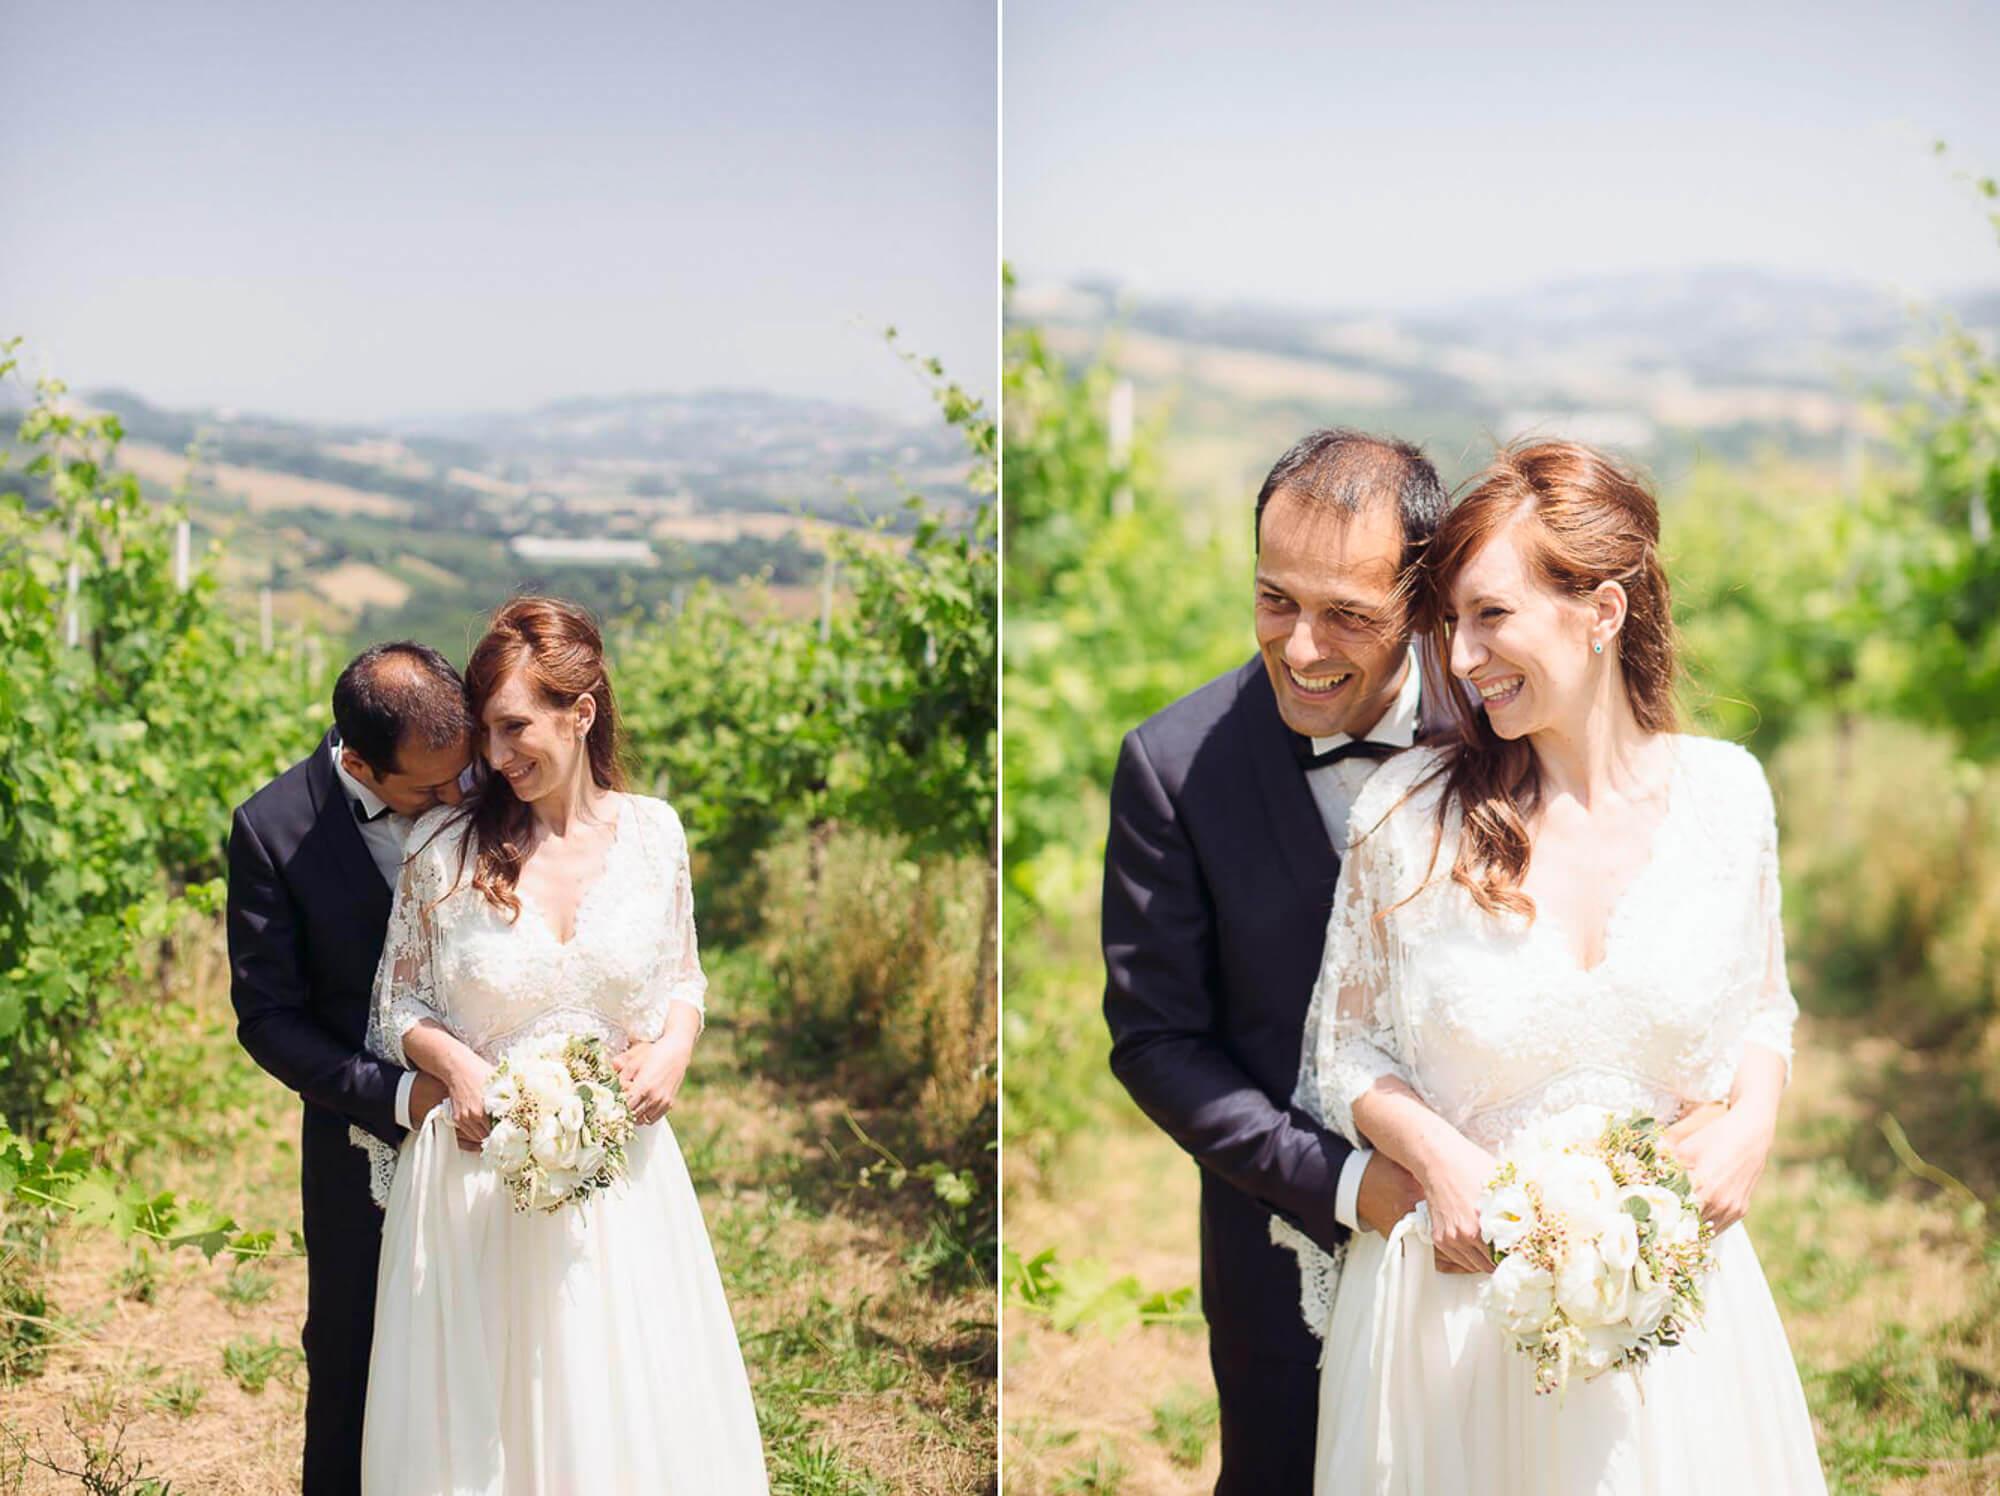 107_wedding_marche_vineyard wedding photography.jpg